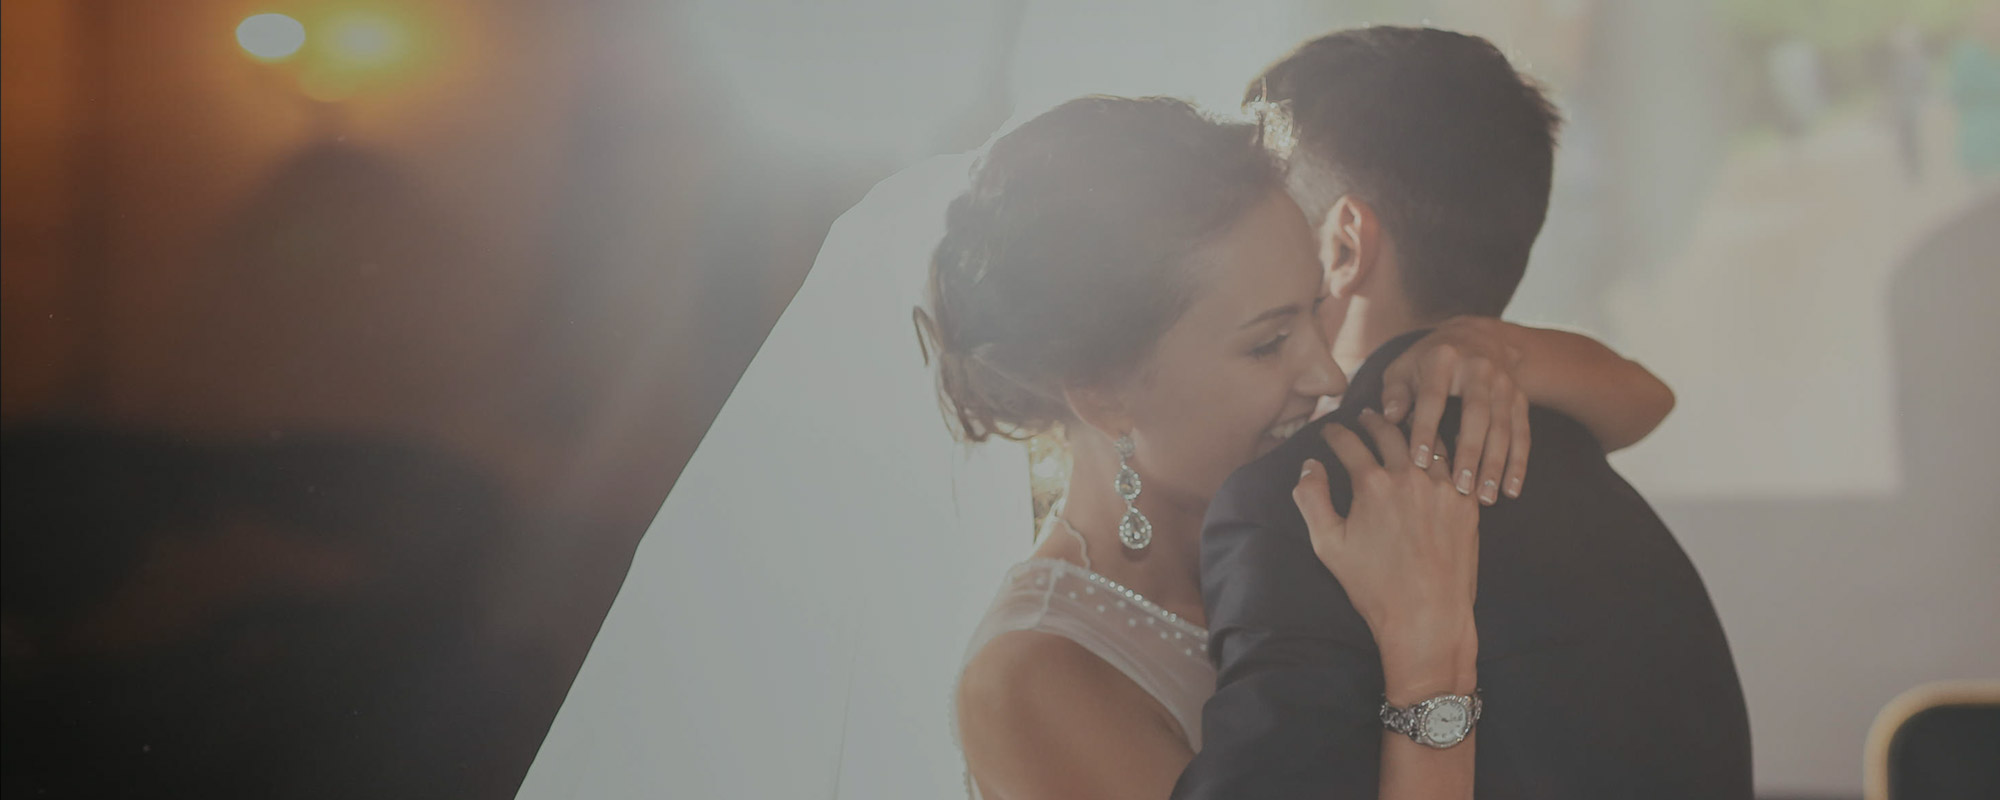 Robyn Haley Marriage Celebrant Sydney New South Wales